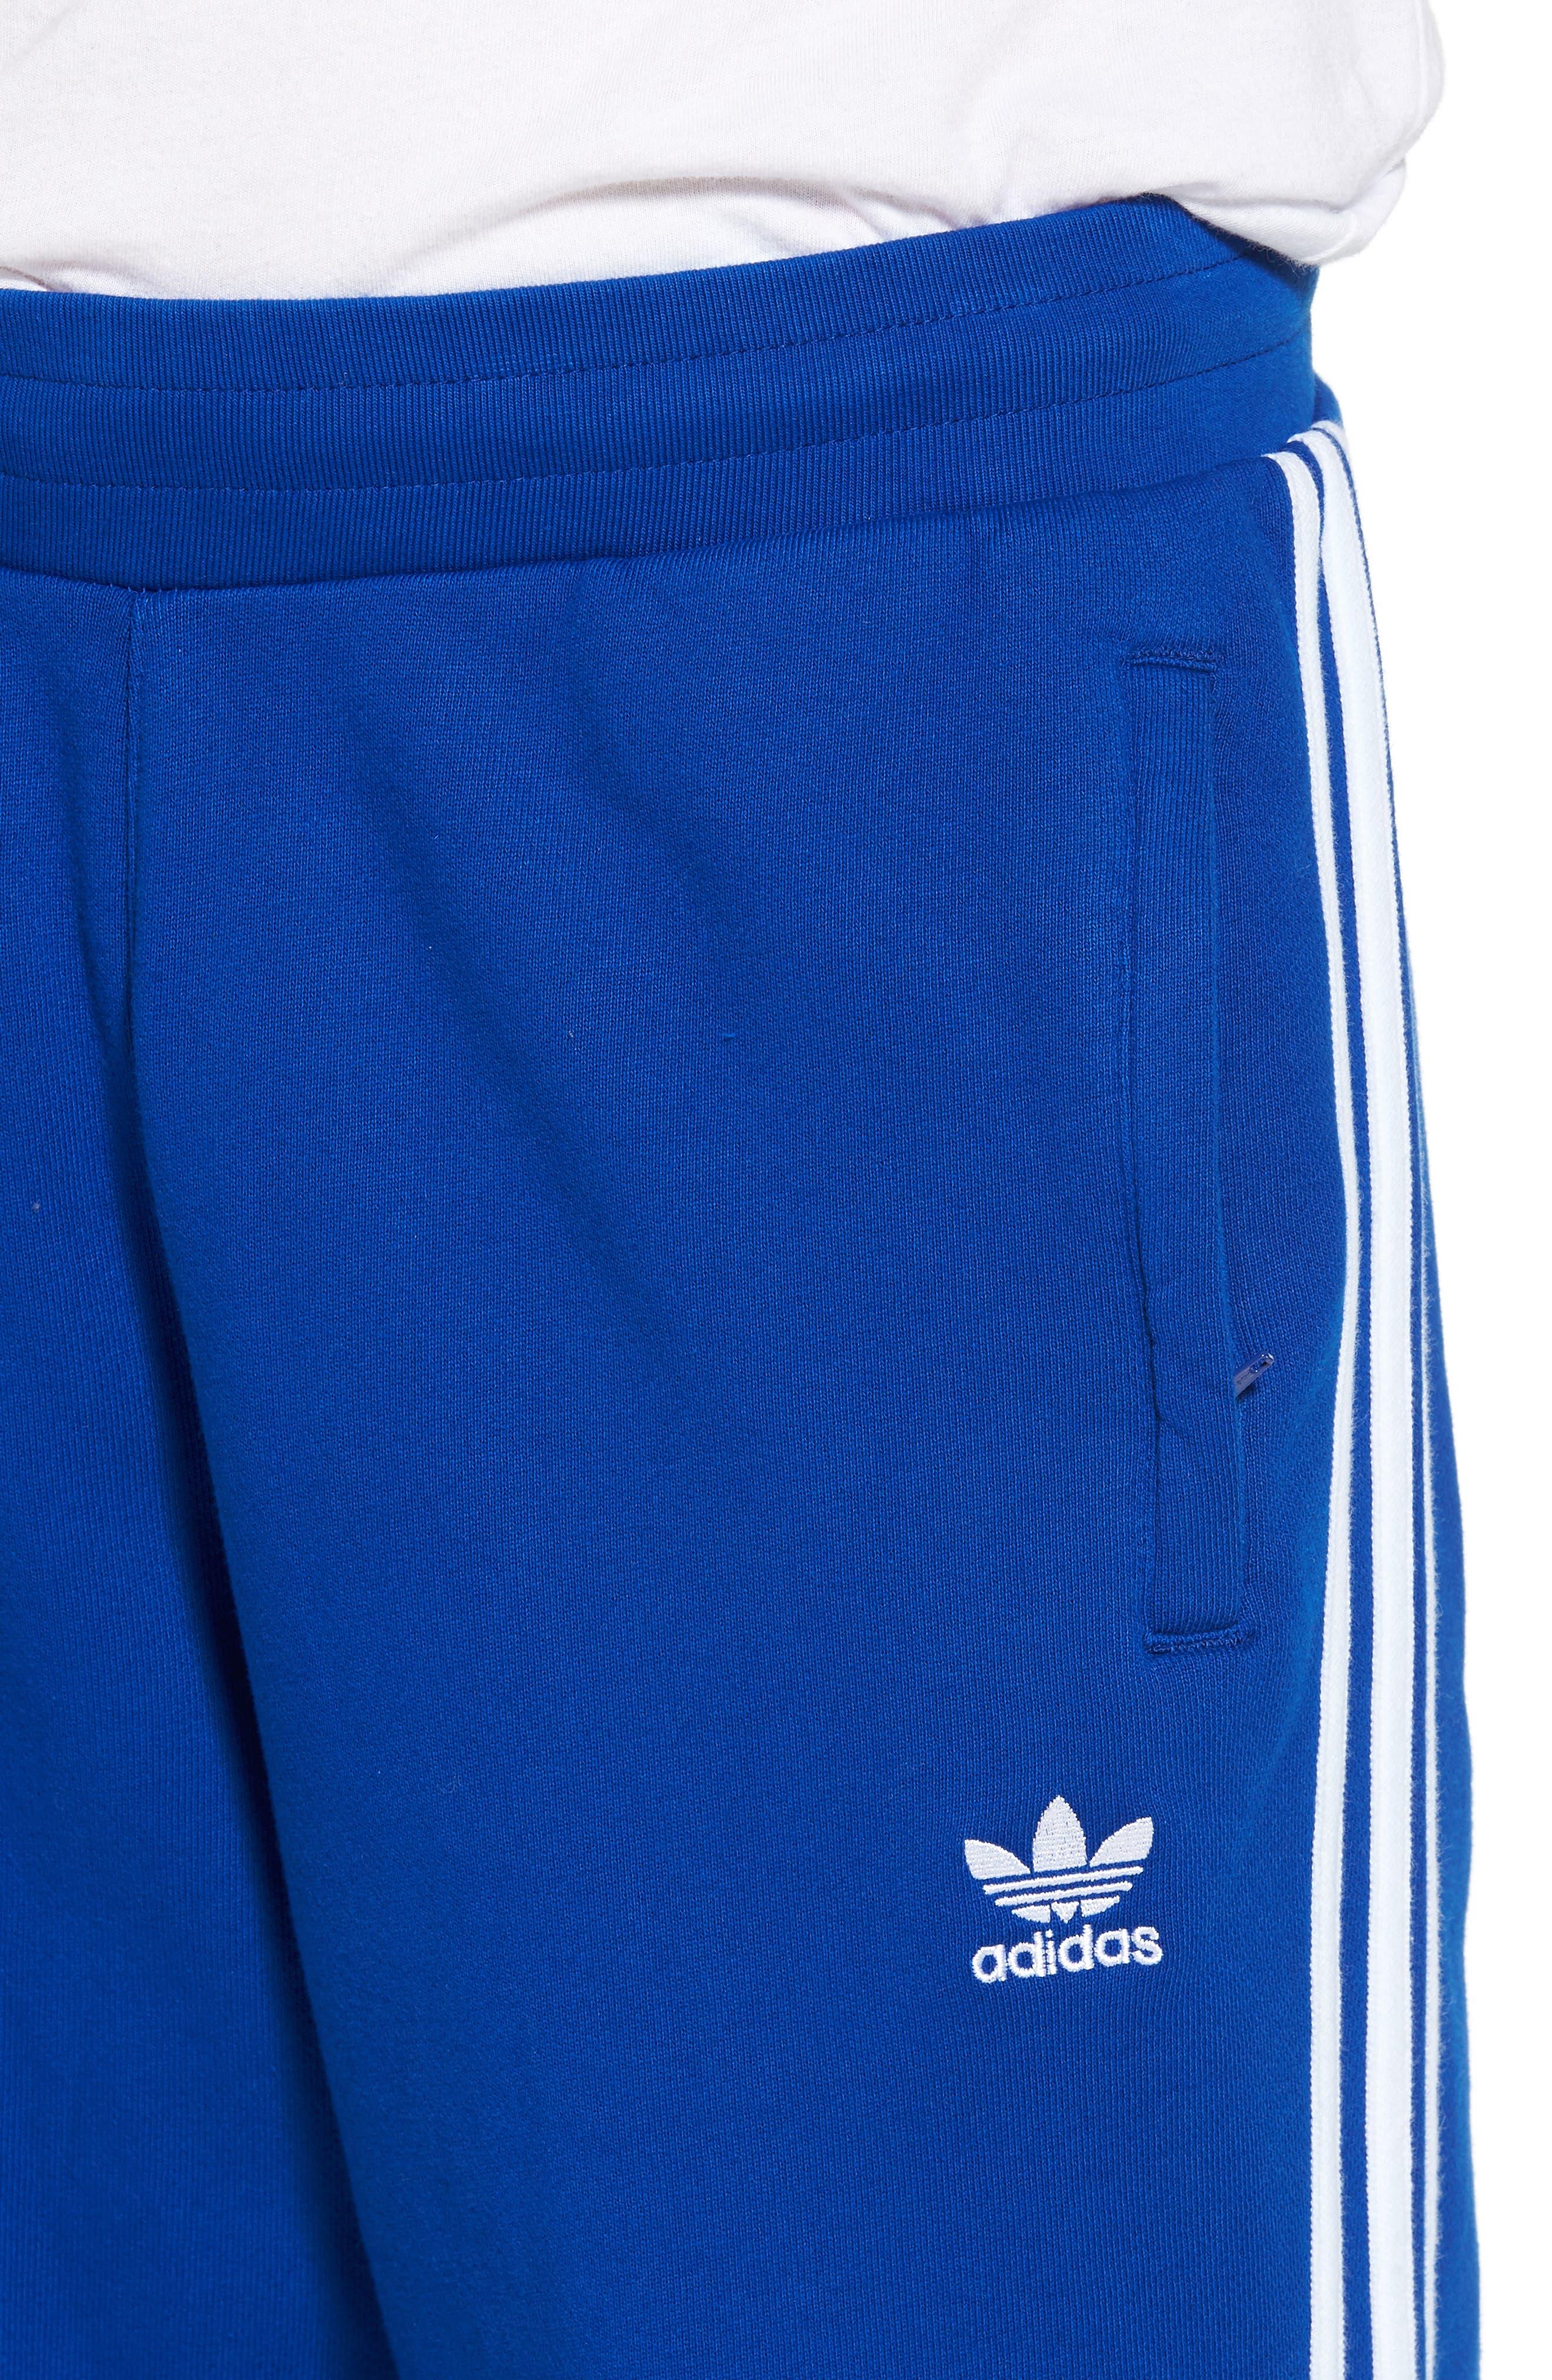 3-Stripes Sweatpants,                             Alternate thumbnail 4, color,                             400